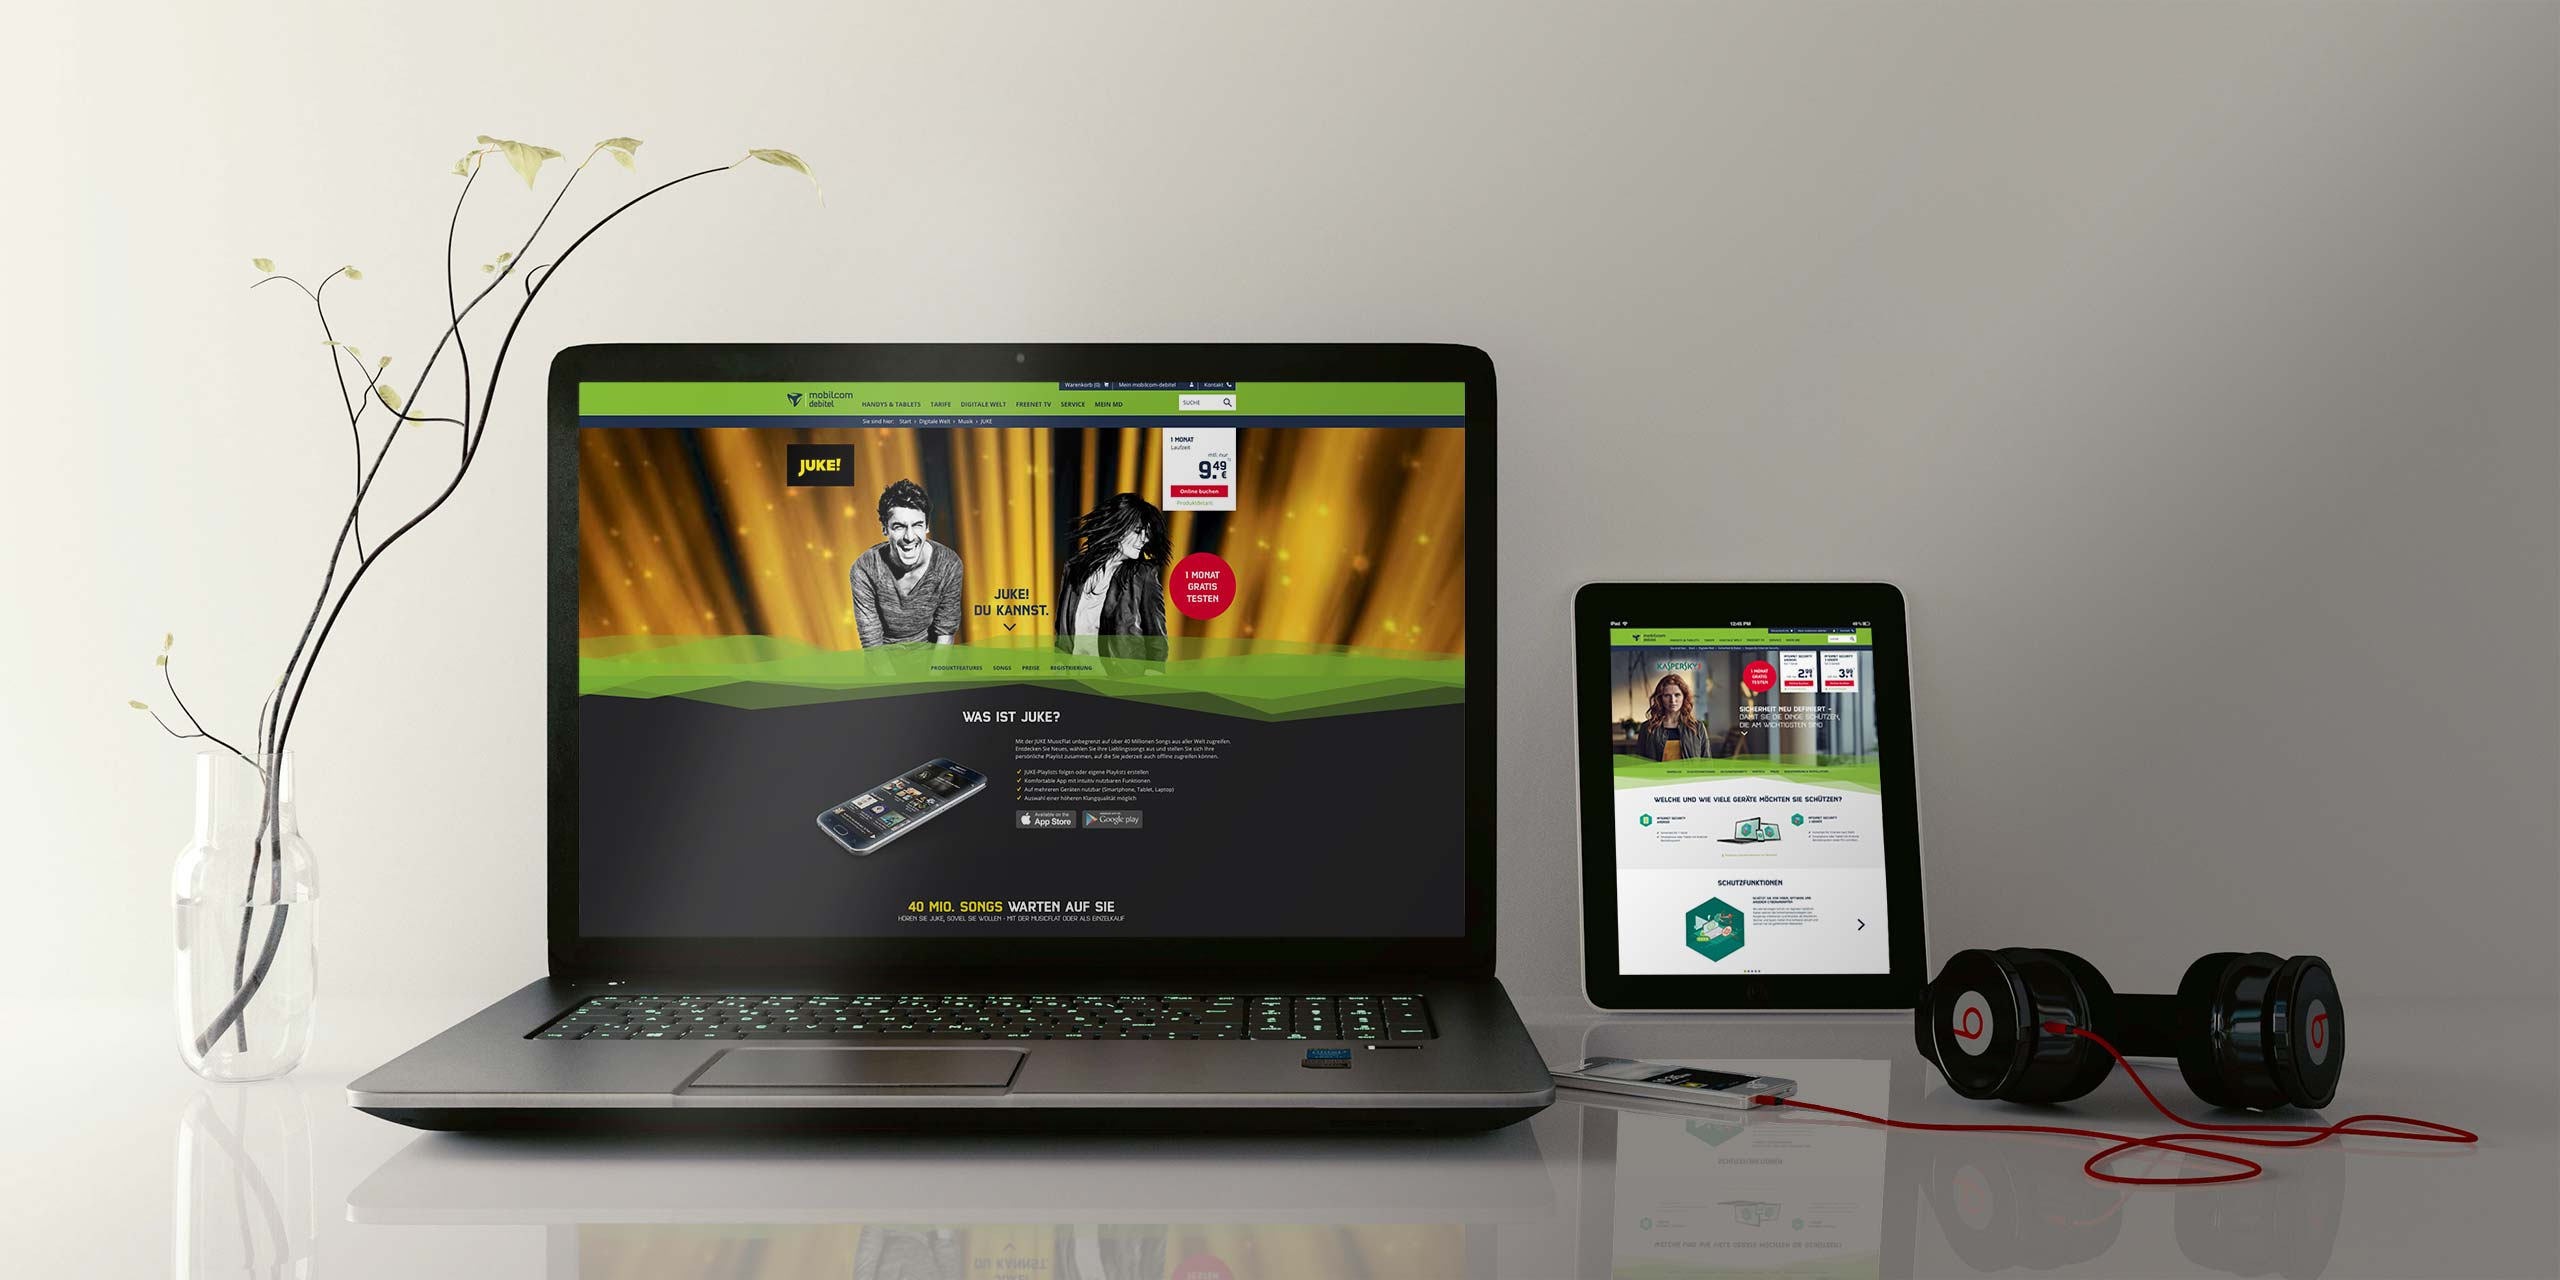 mobilcom-debitel-digital-Branding-Atomic-Design